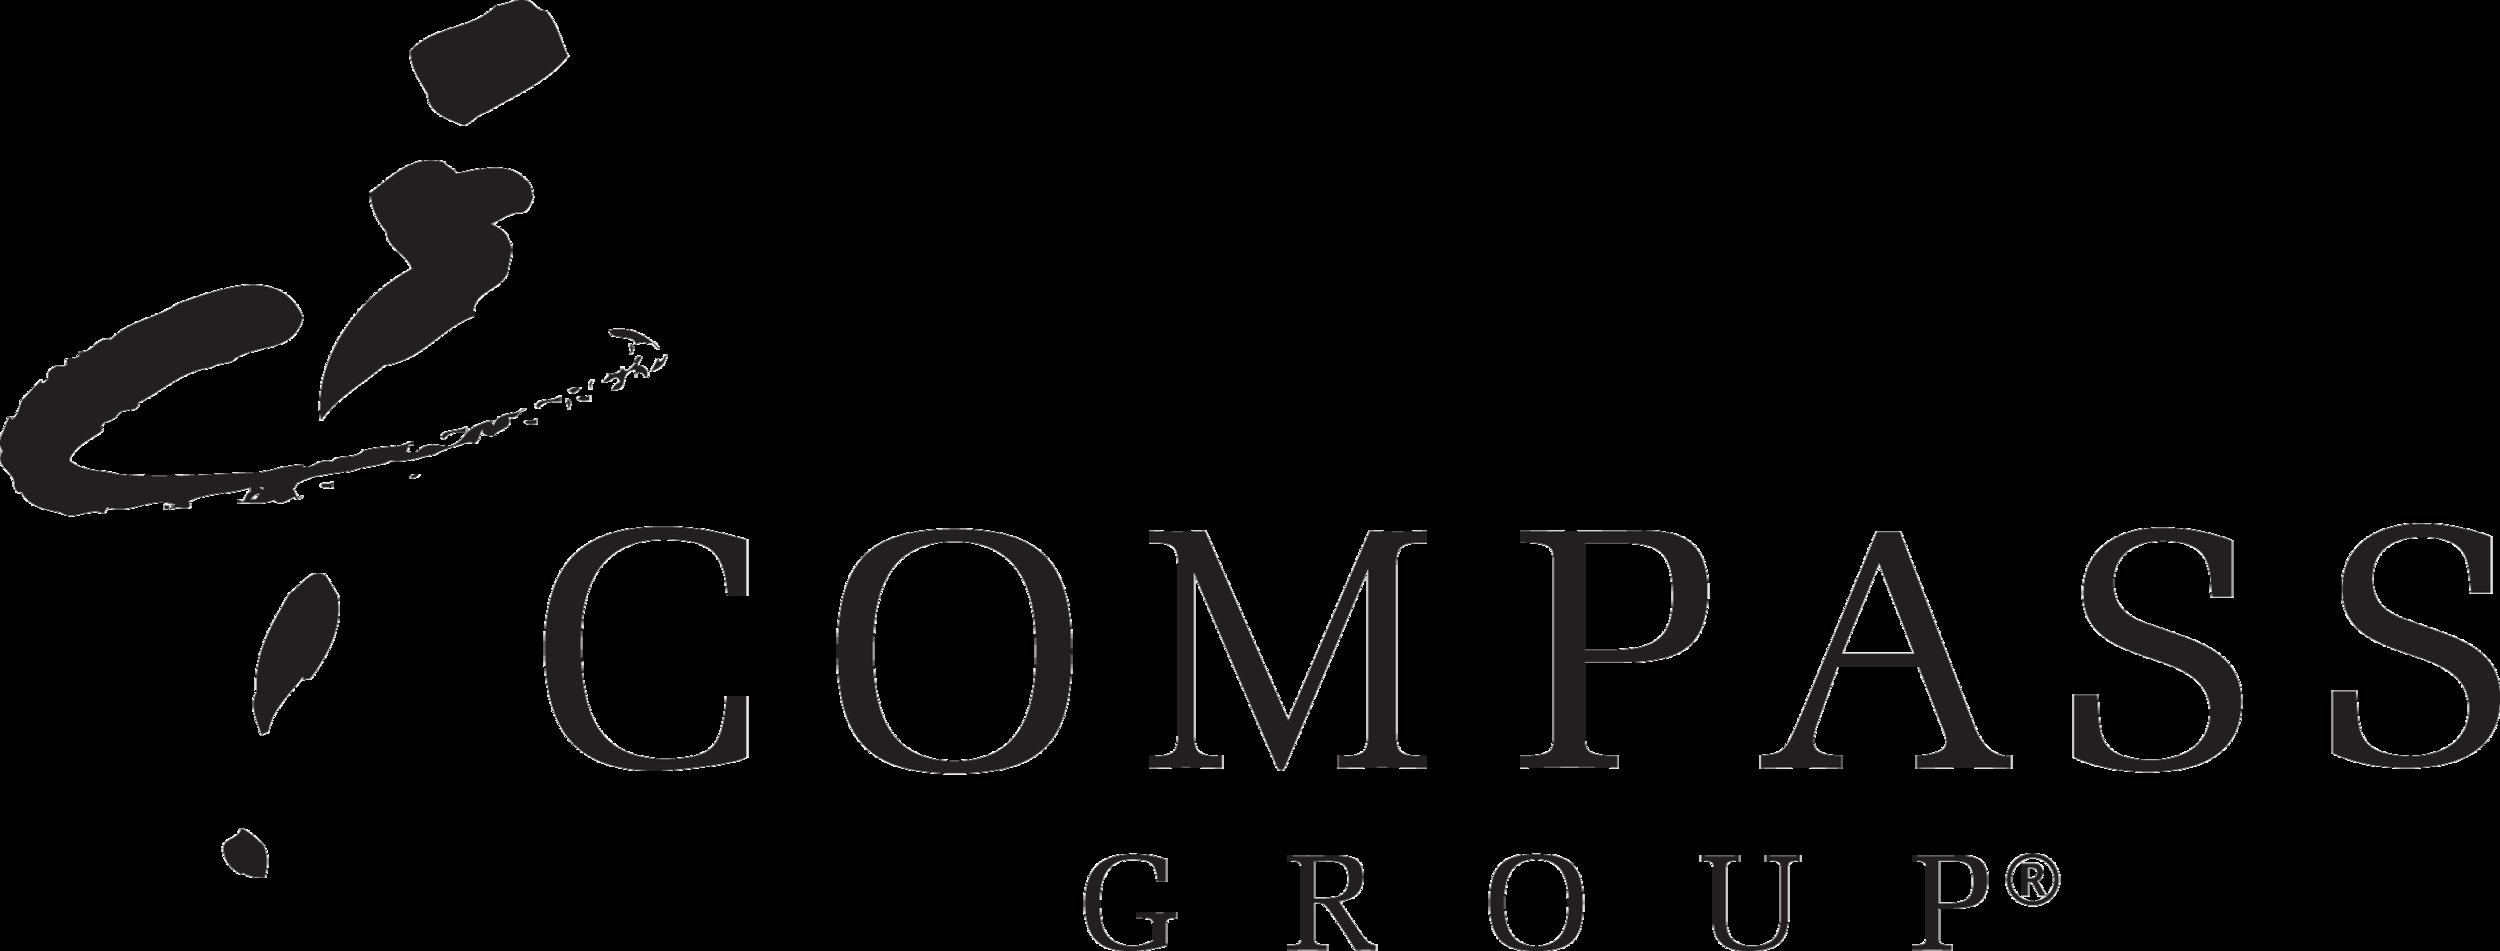 compassgrouplogobw2009.png